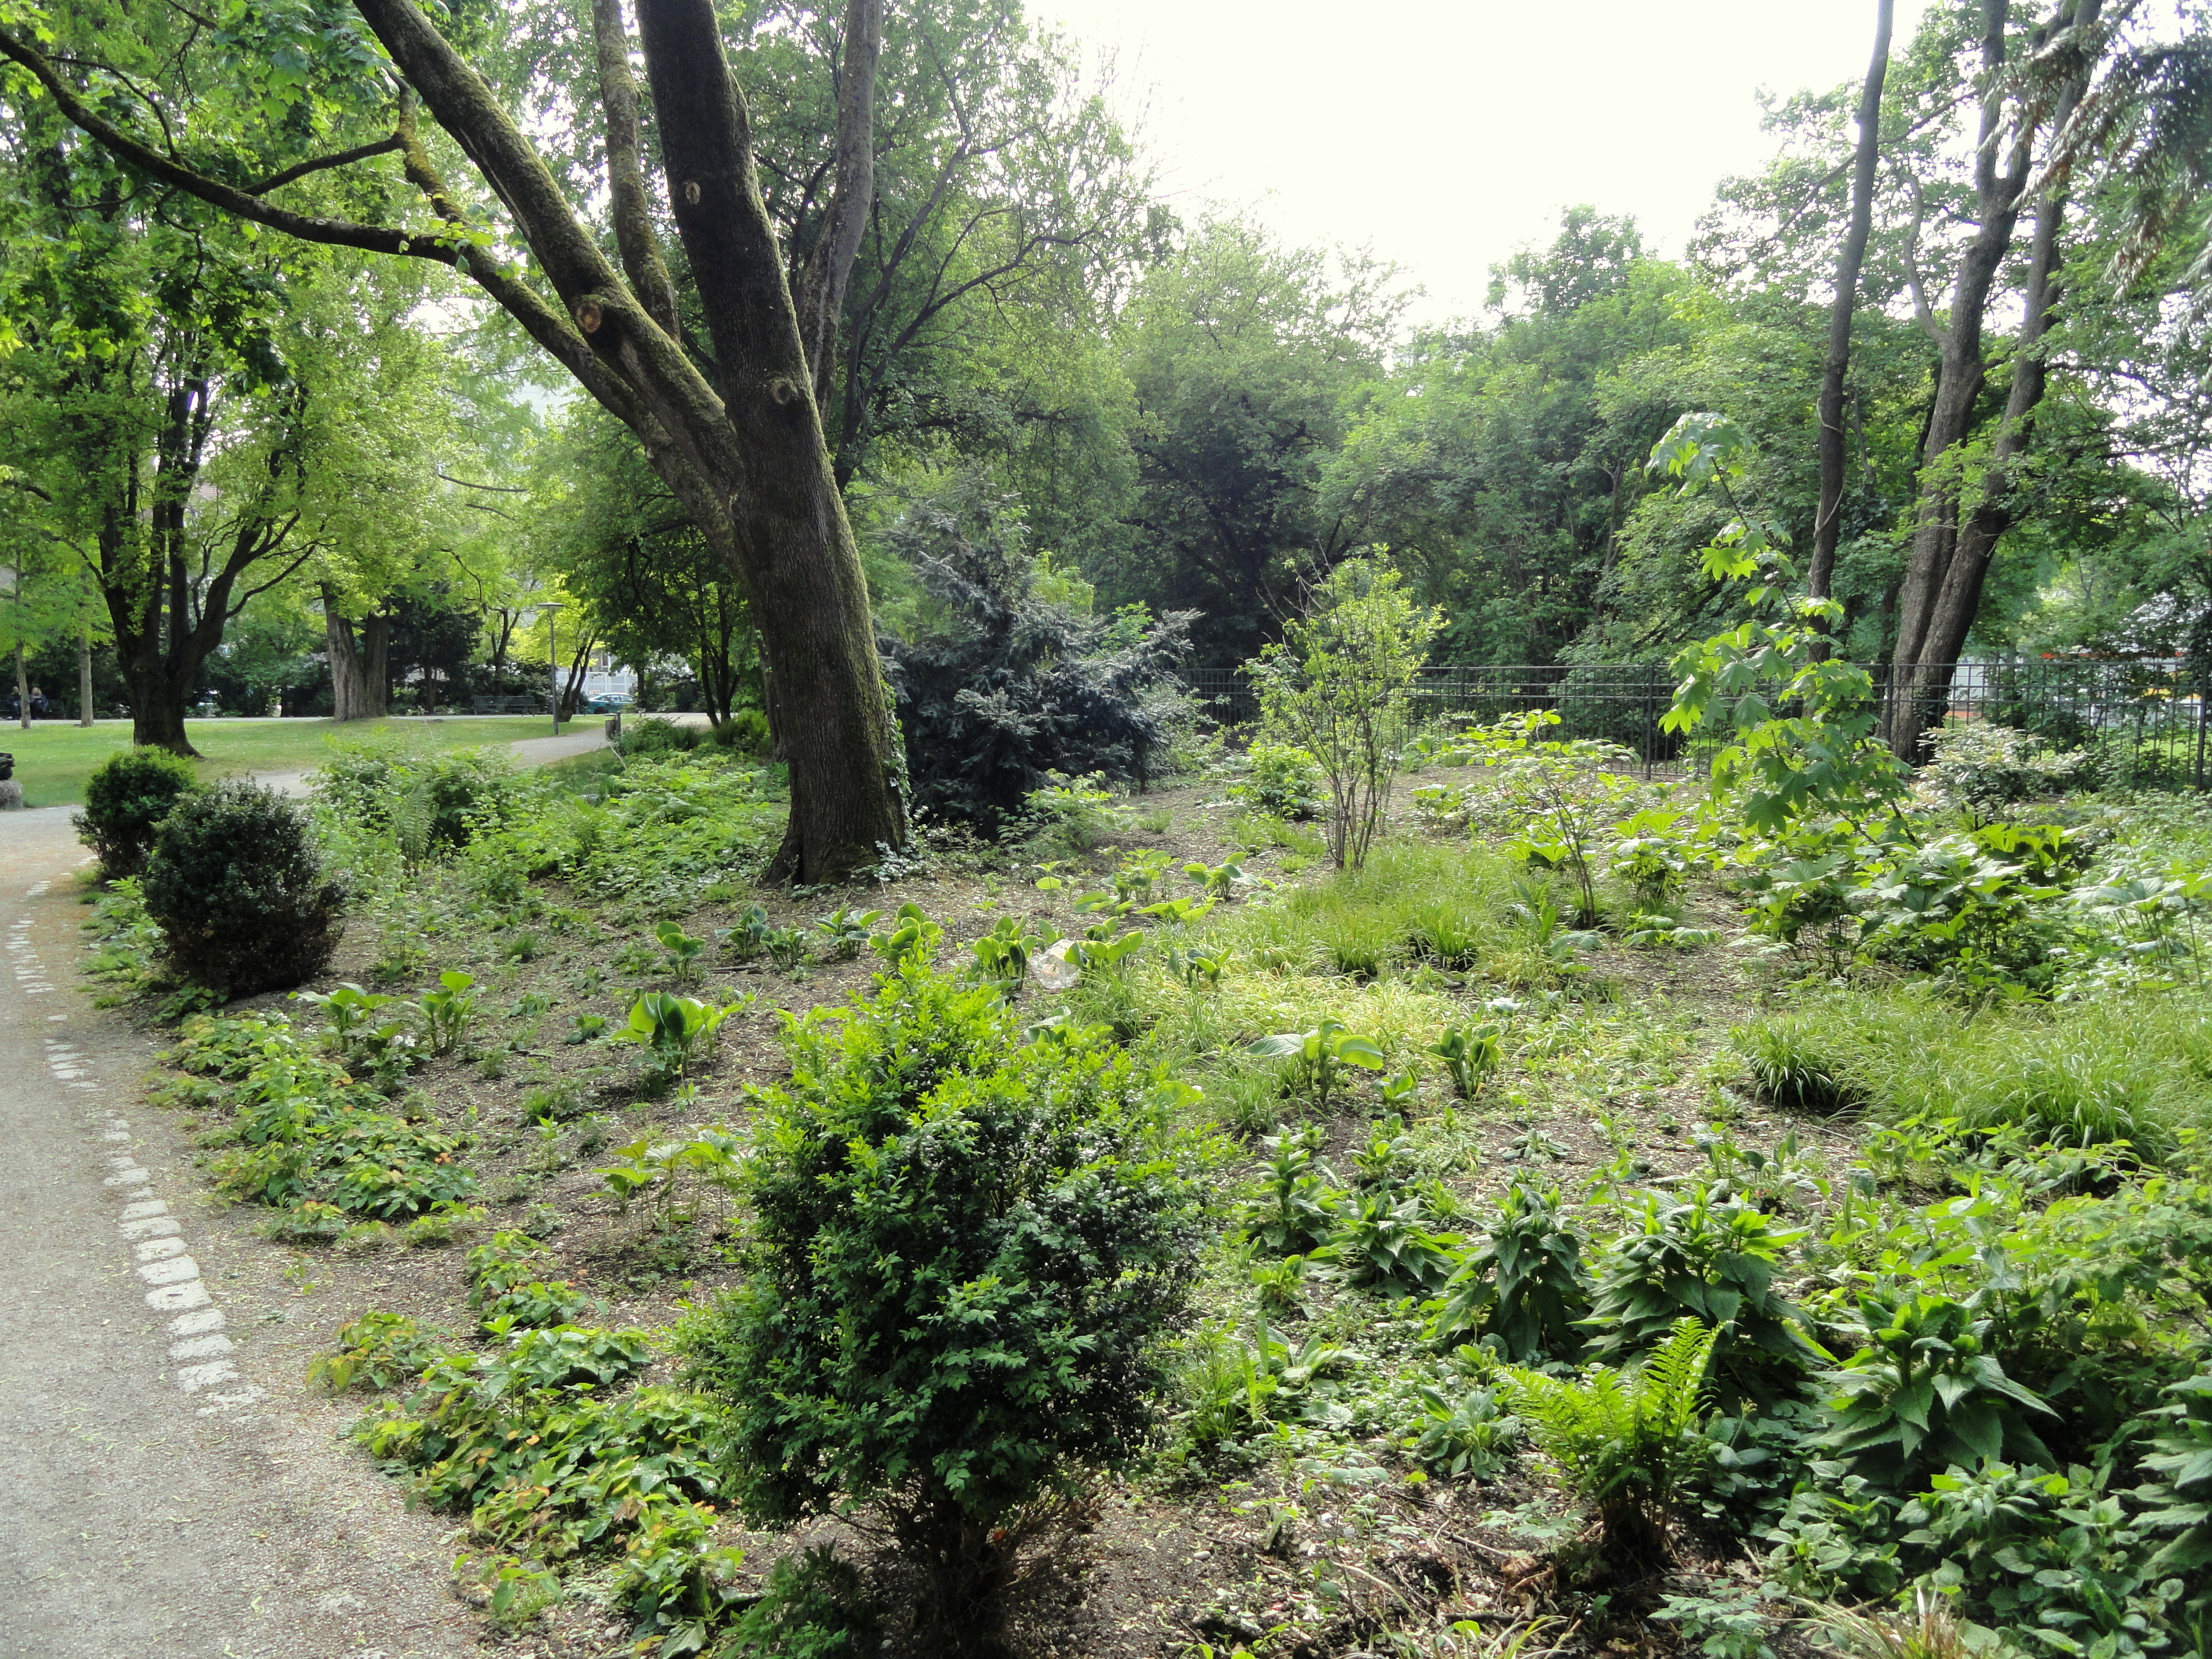 Alter Botanischer Garten Munchen Ausstellung ~ Home Design ...